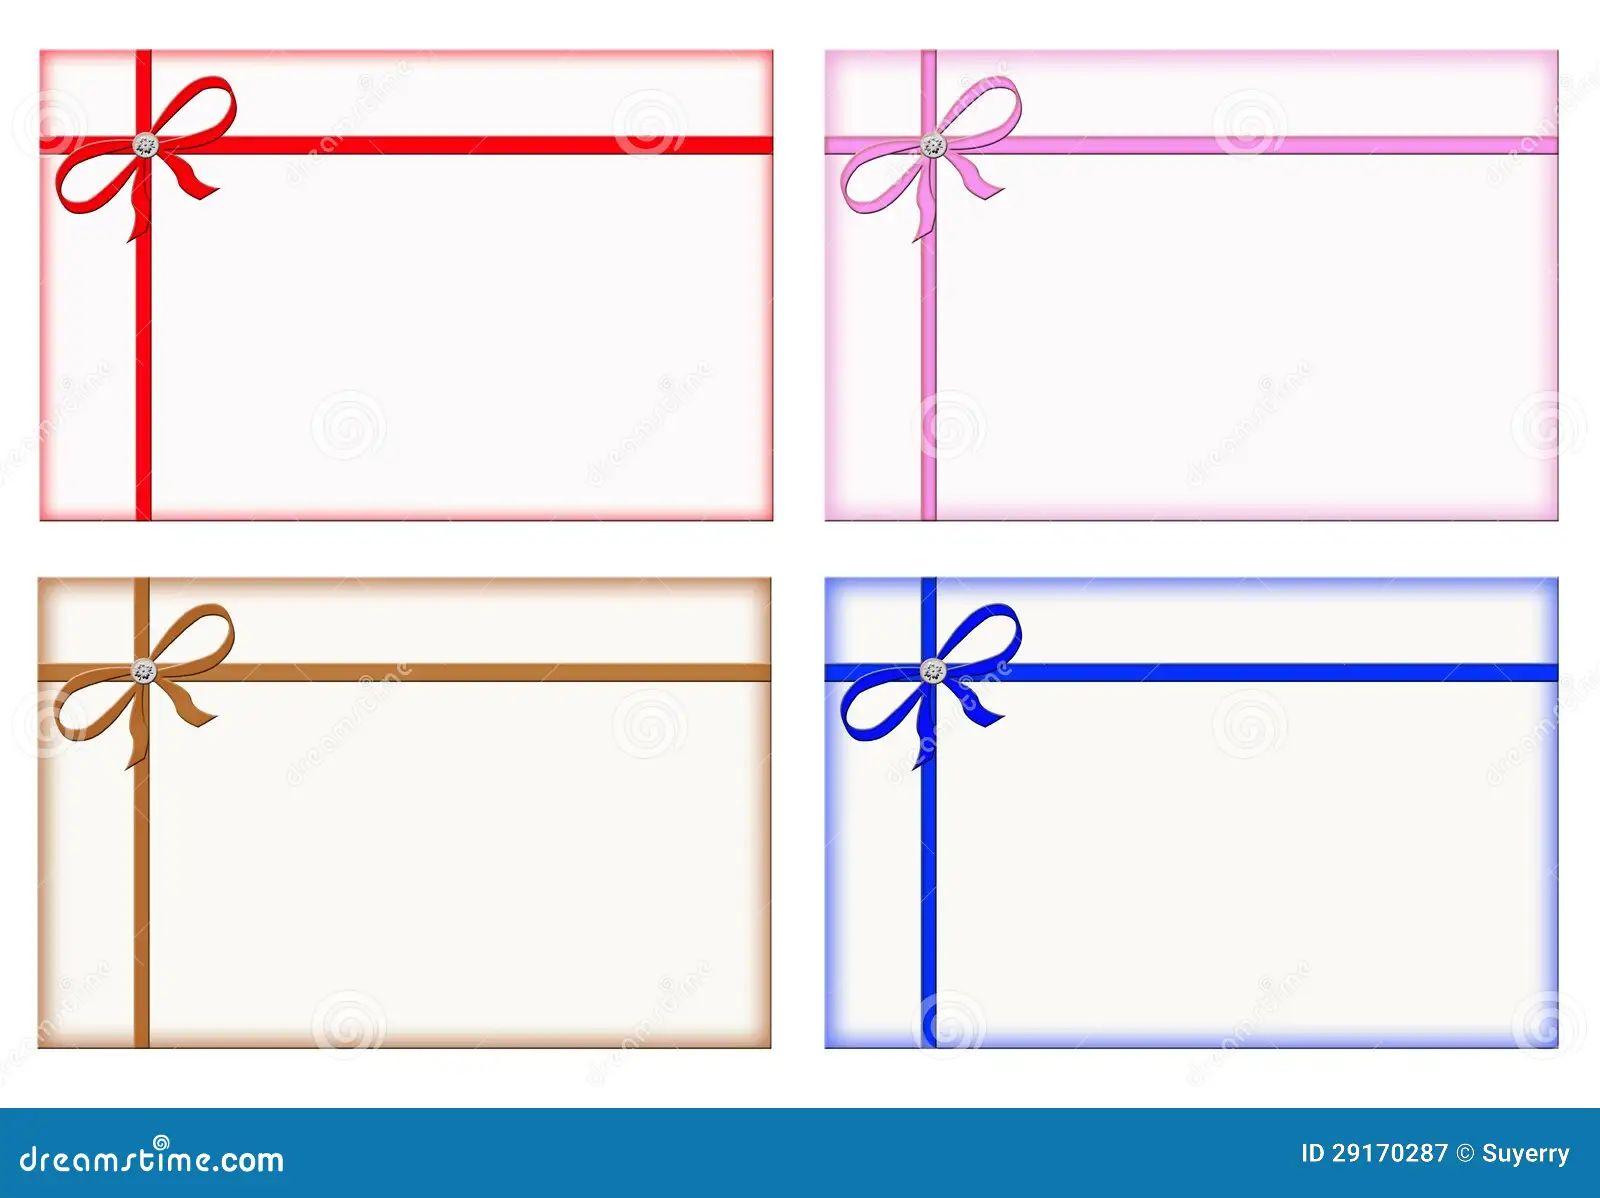 blank response cards